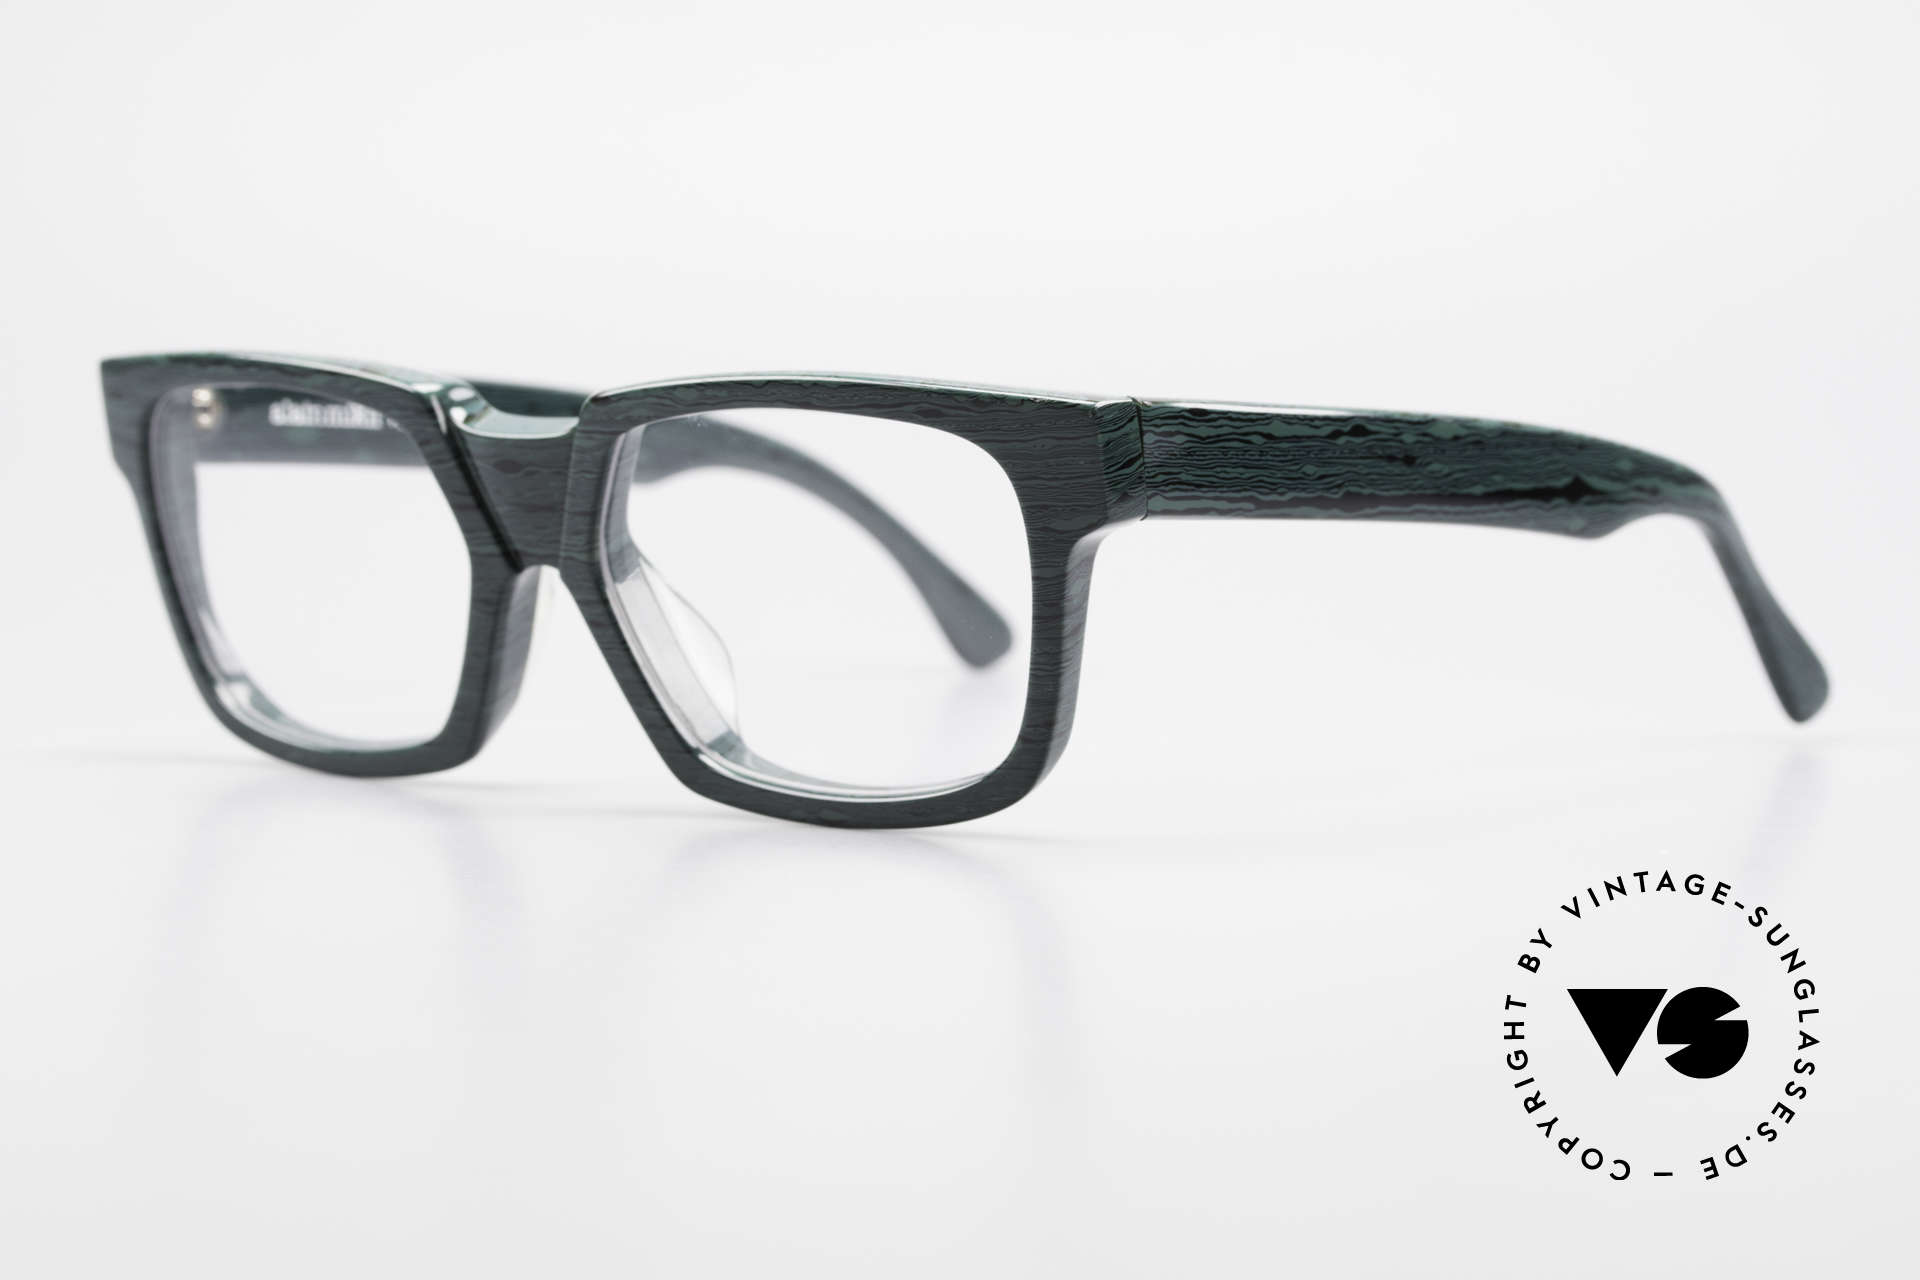 Alain Mikli 0143 / 285 Striking 1980's Eyeglasses, green-black marbled, top-notch quality, handmade!, Made for Men and Women